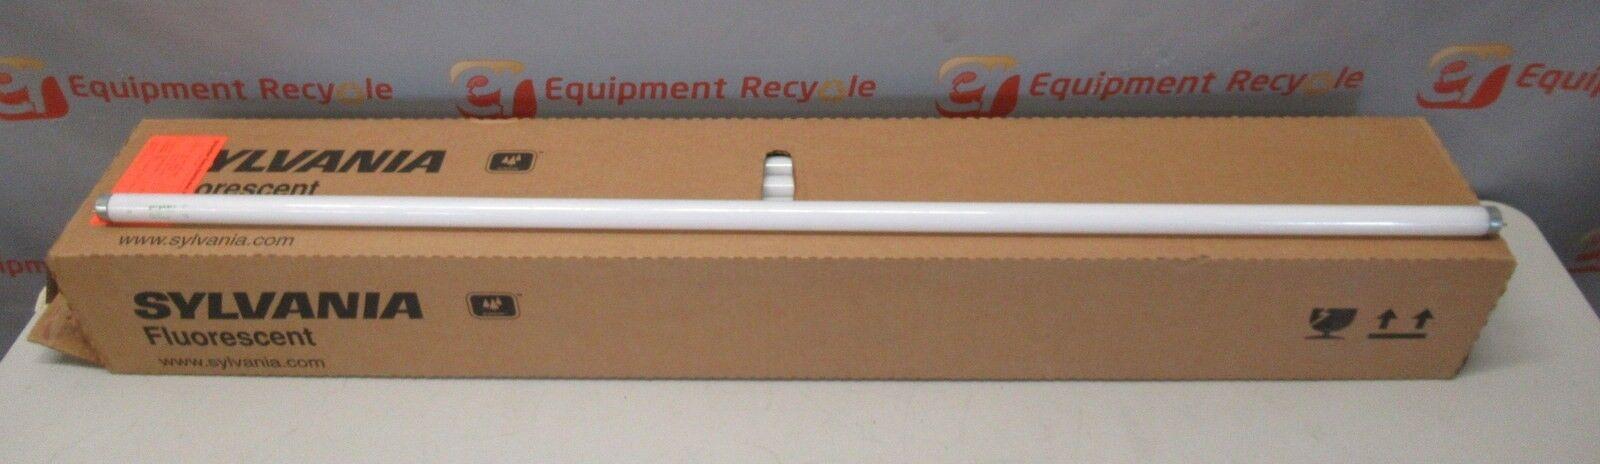 Sylvania 21998-1 Rapid Start T8 Mediano Bipin 32 W Bombilla fluorescentes Lote 30